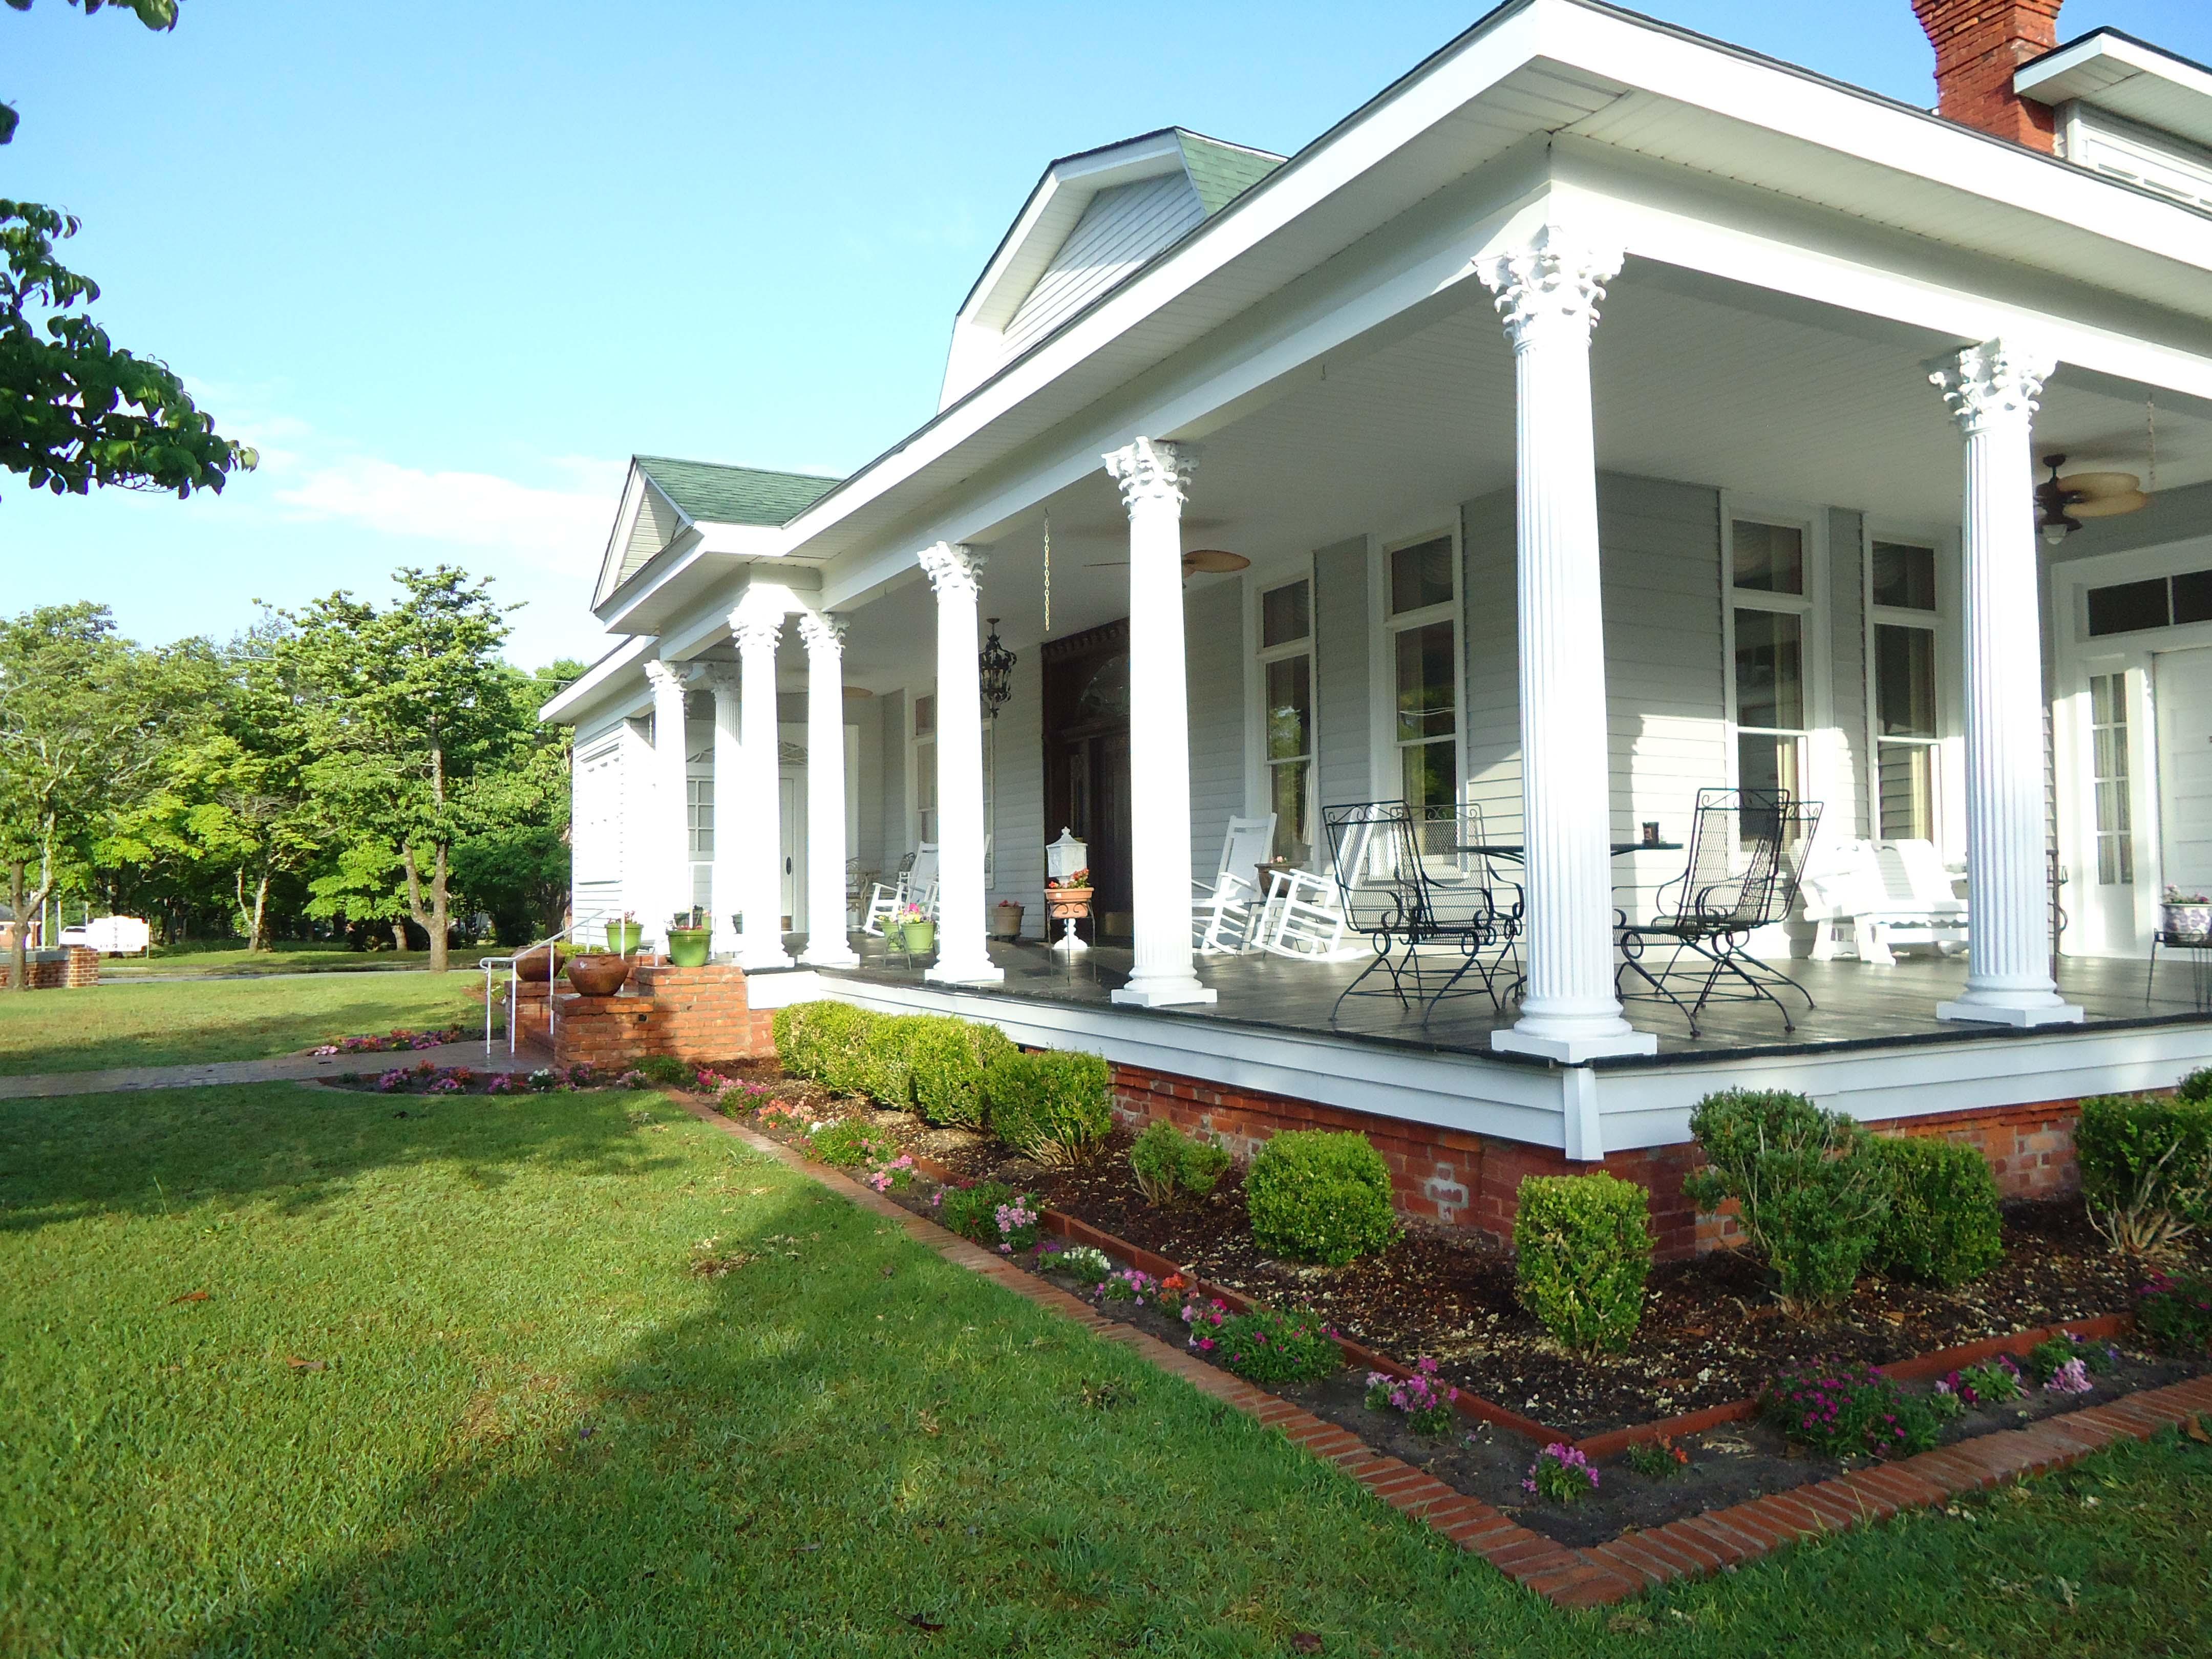 Nine Bedroom Historic B&B in Swainsboro Georgia -Edenfield House